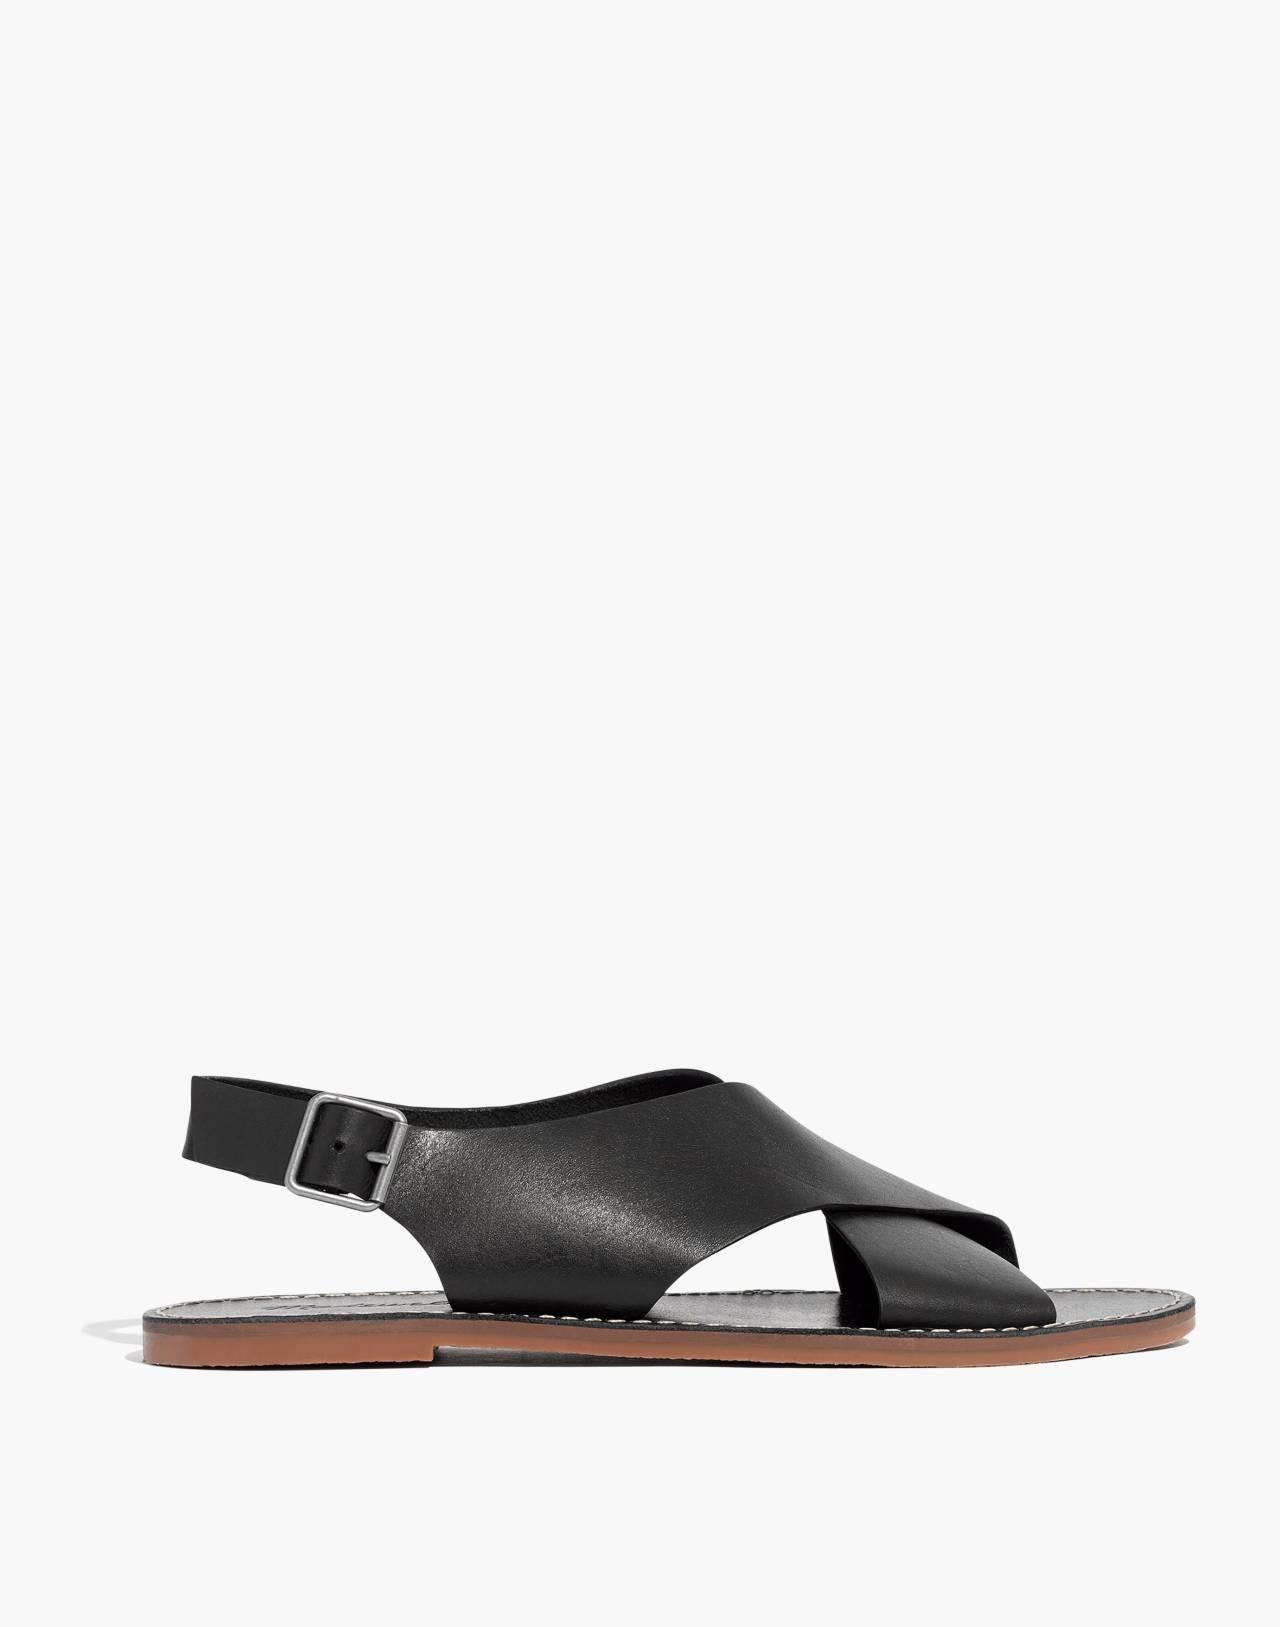 The Boardwalk Crossover Sandal in true black image 2